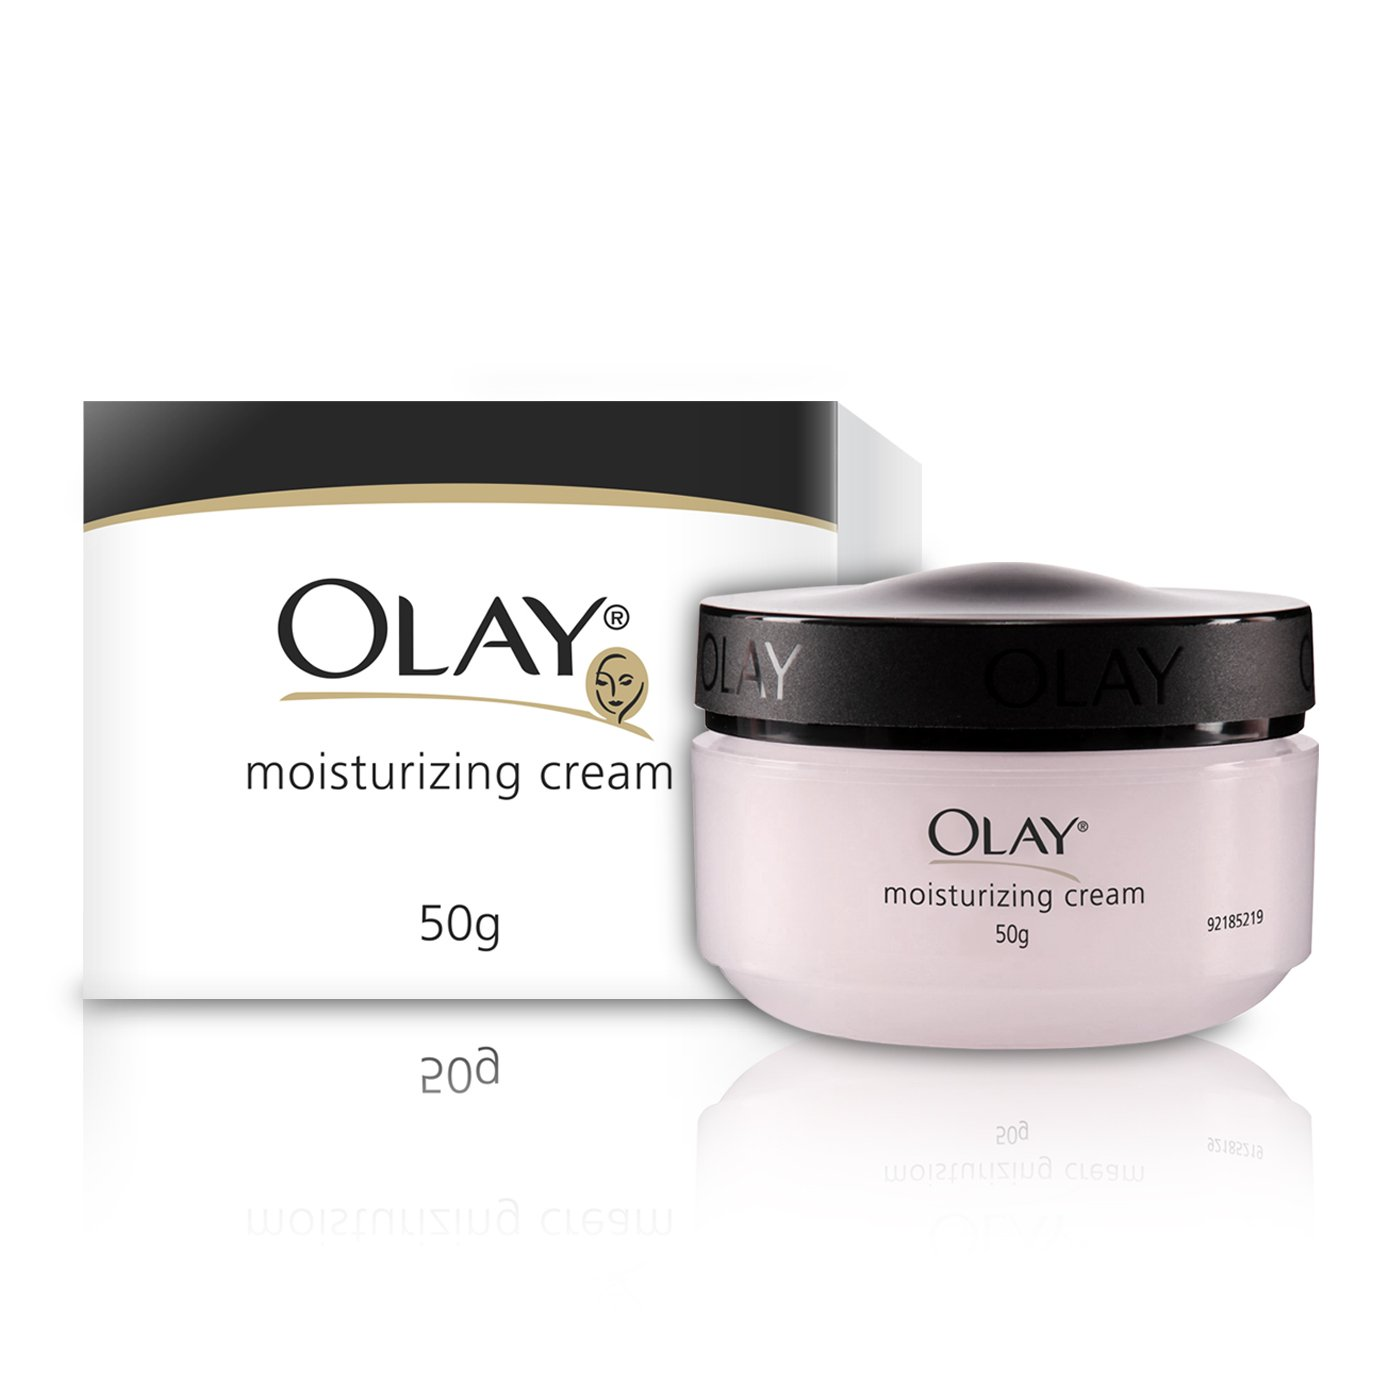 Olay Moisturizing Skin Cream